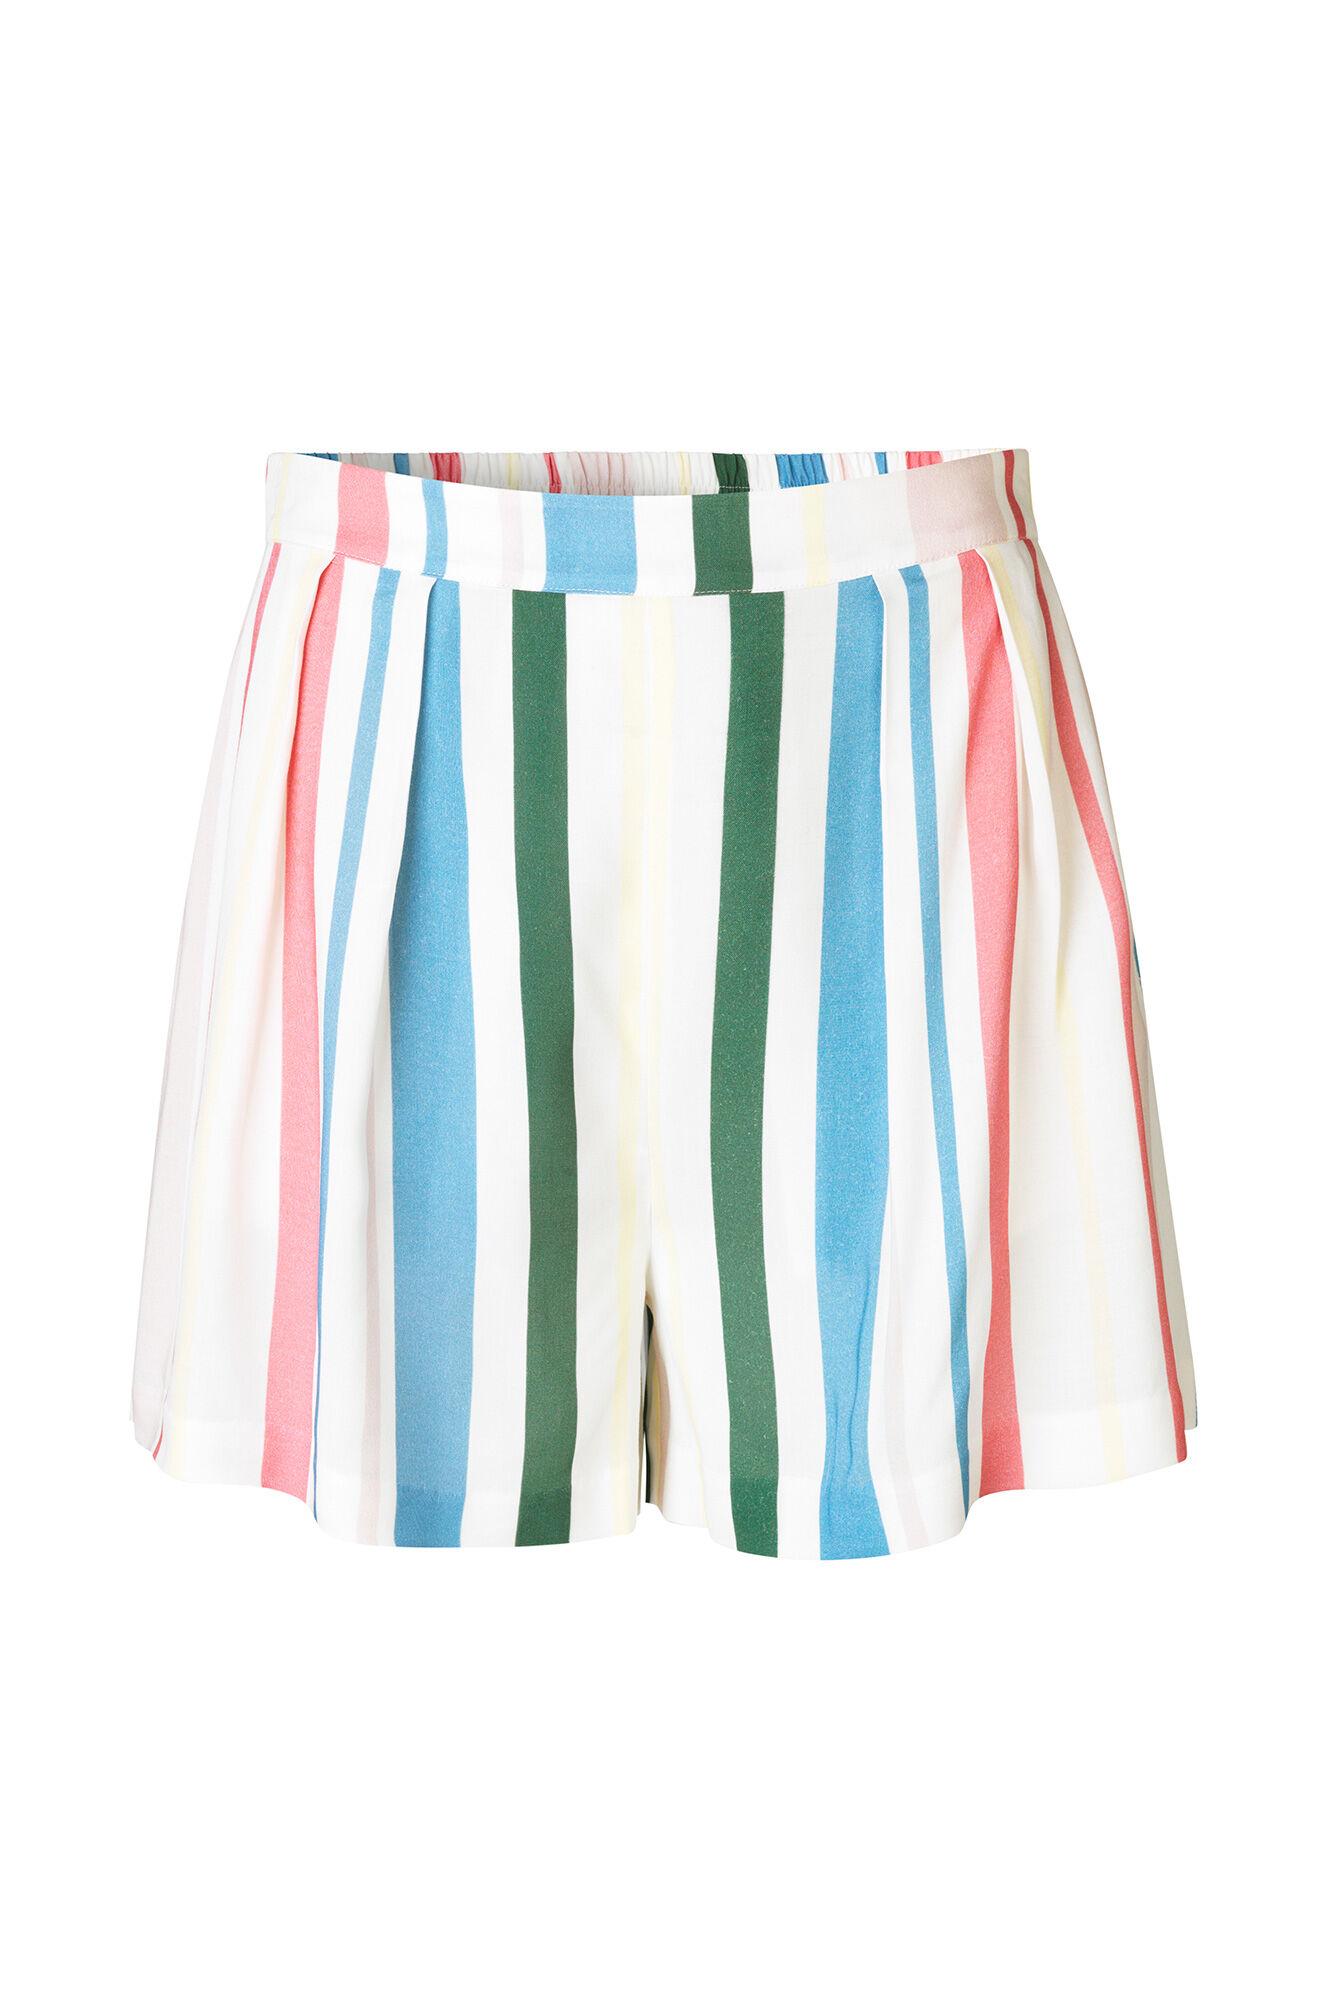 Ganda shorts aop 9943